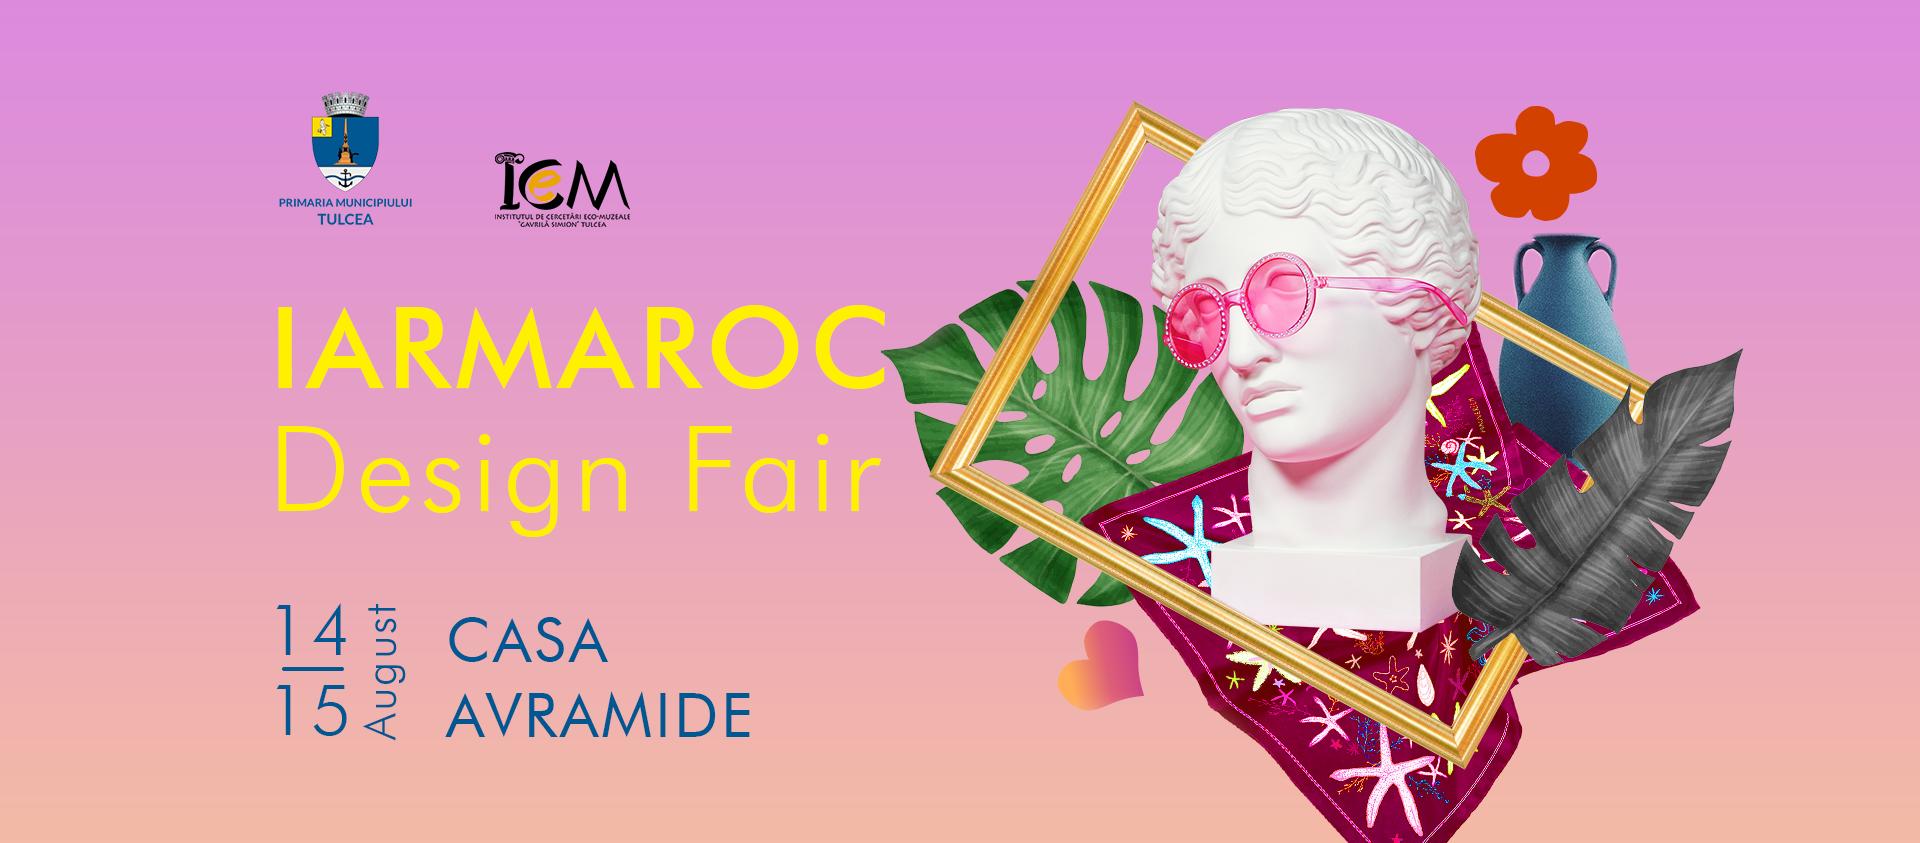 Iarmaroc Design Fair 202